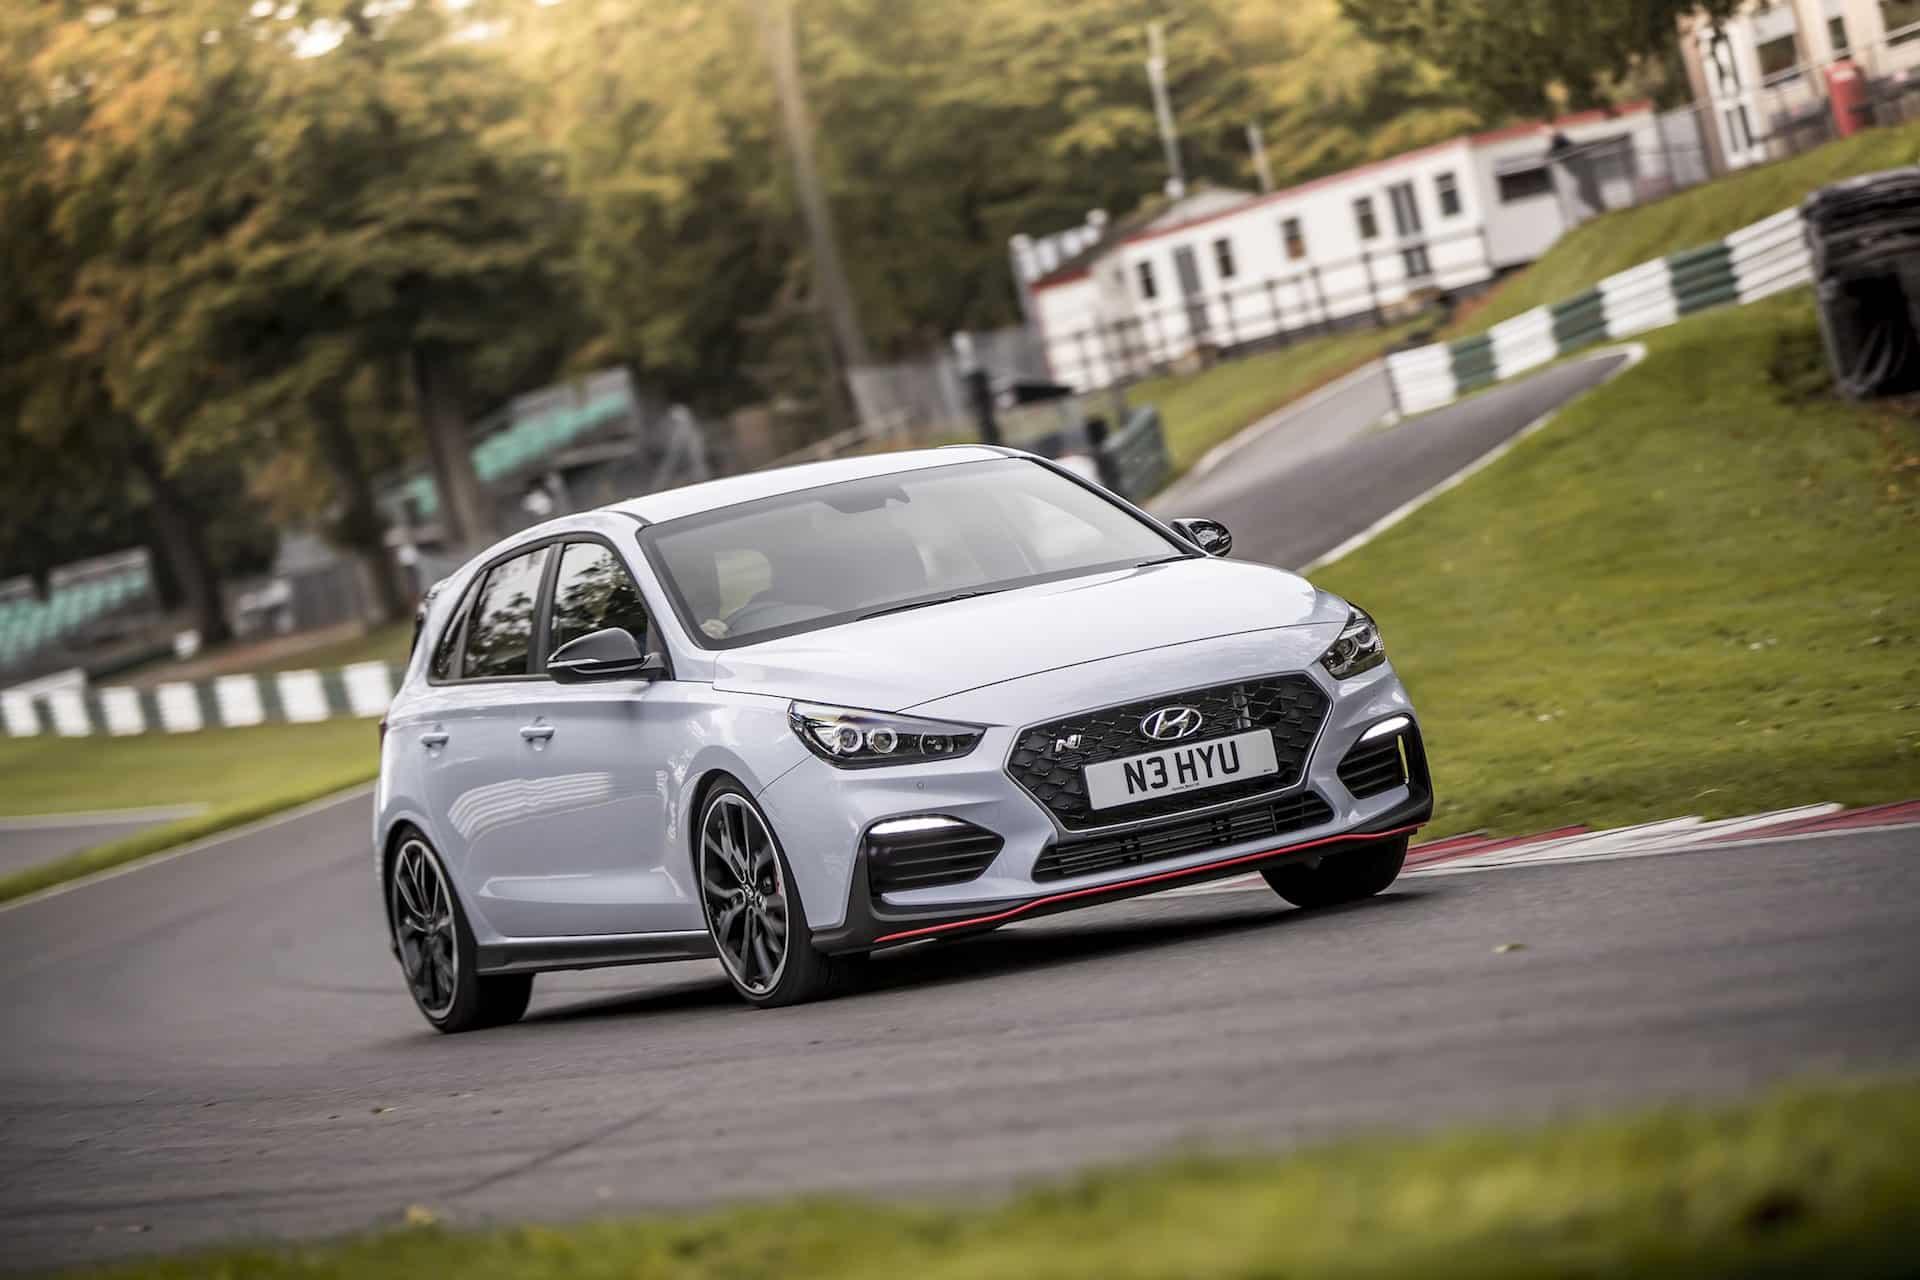 Hyundai i30 N in action at Cadwell Park (The Car Expert)